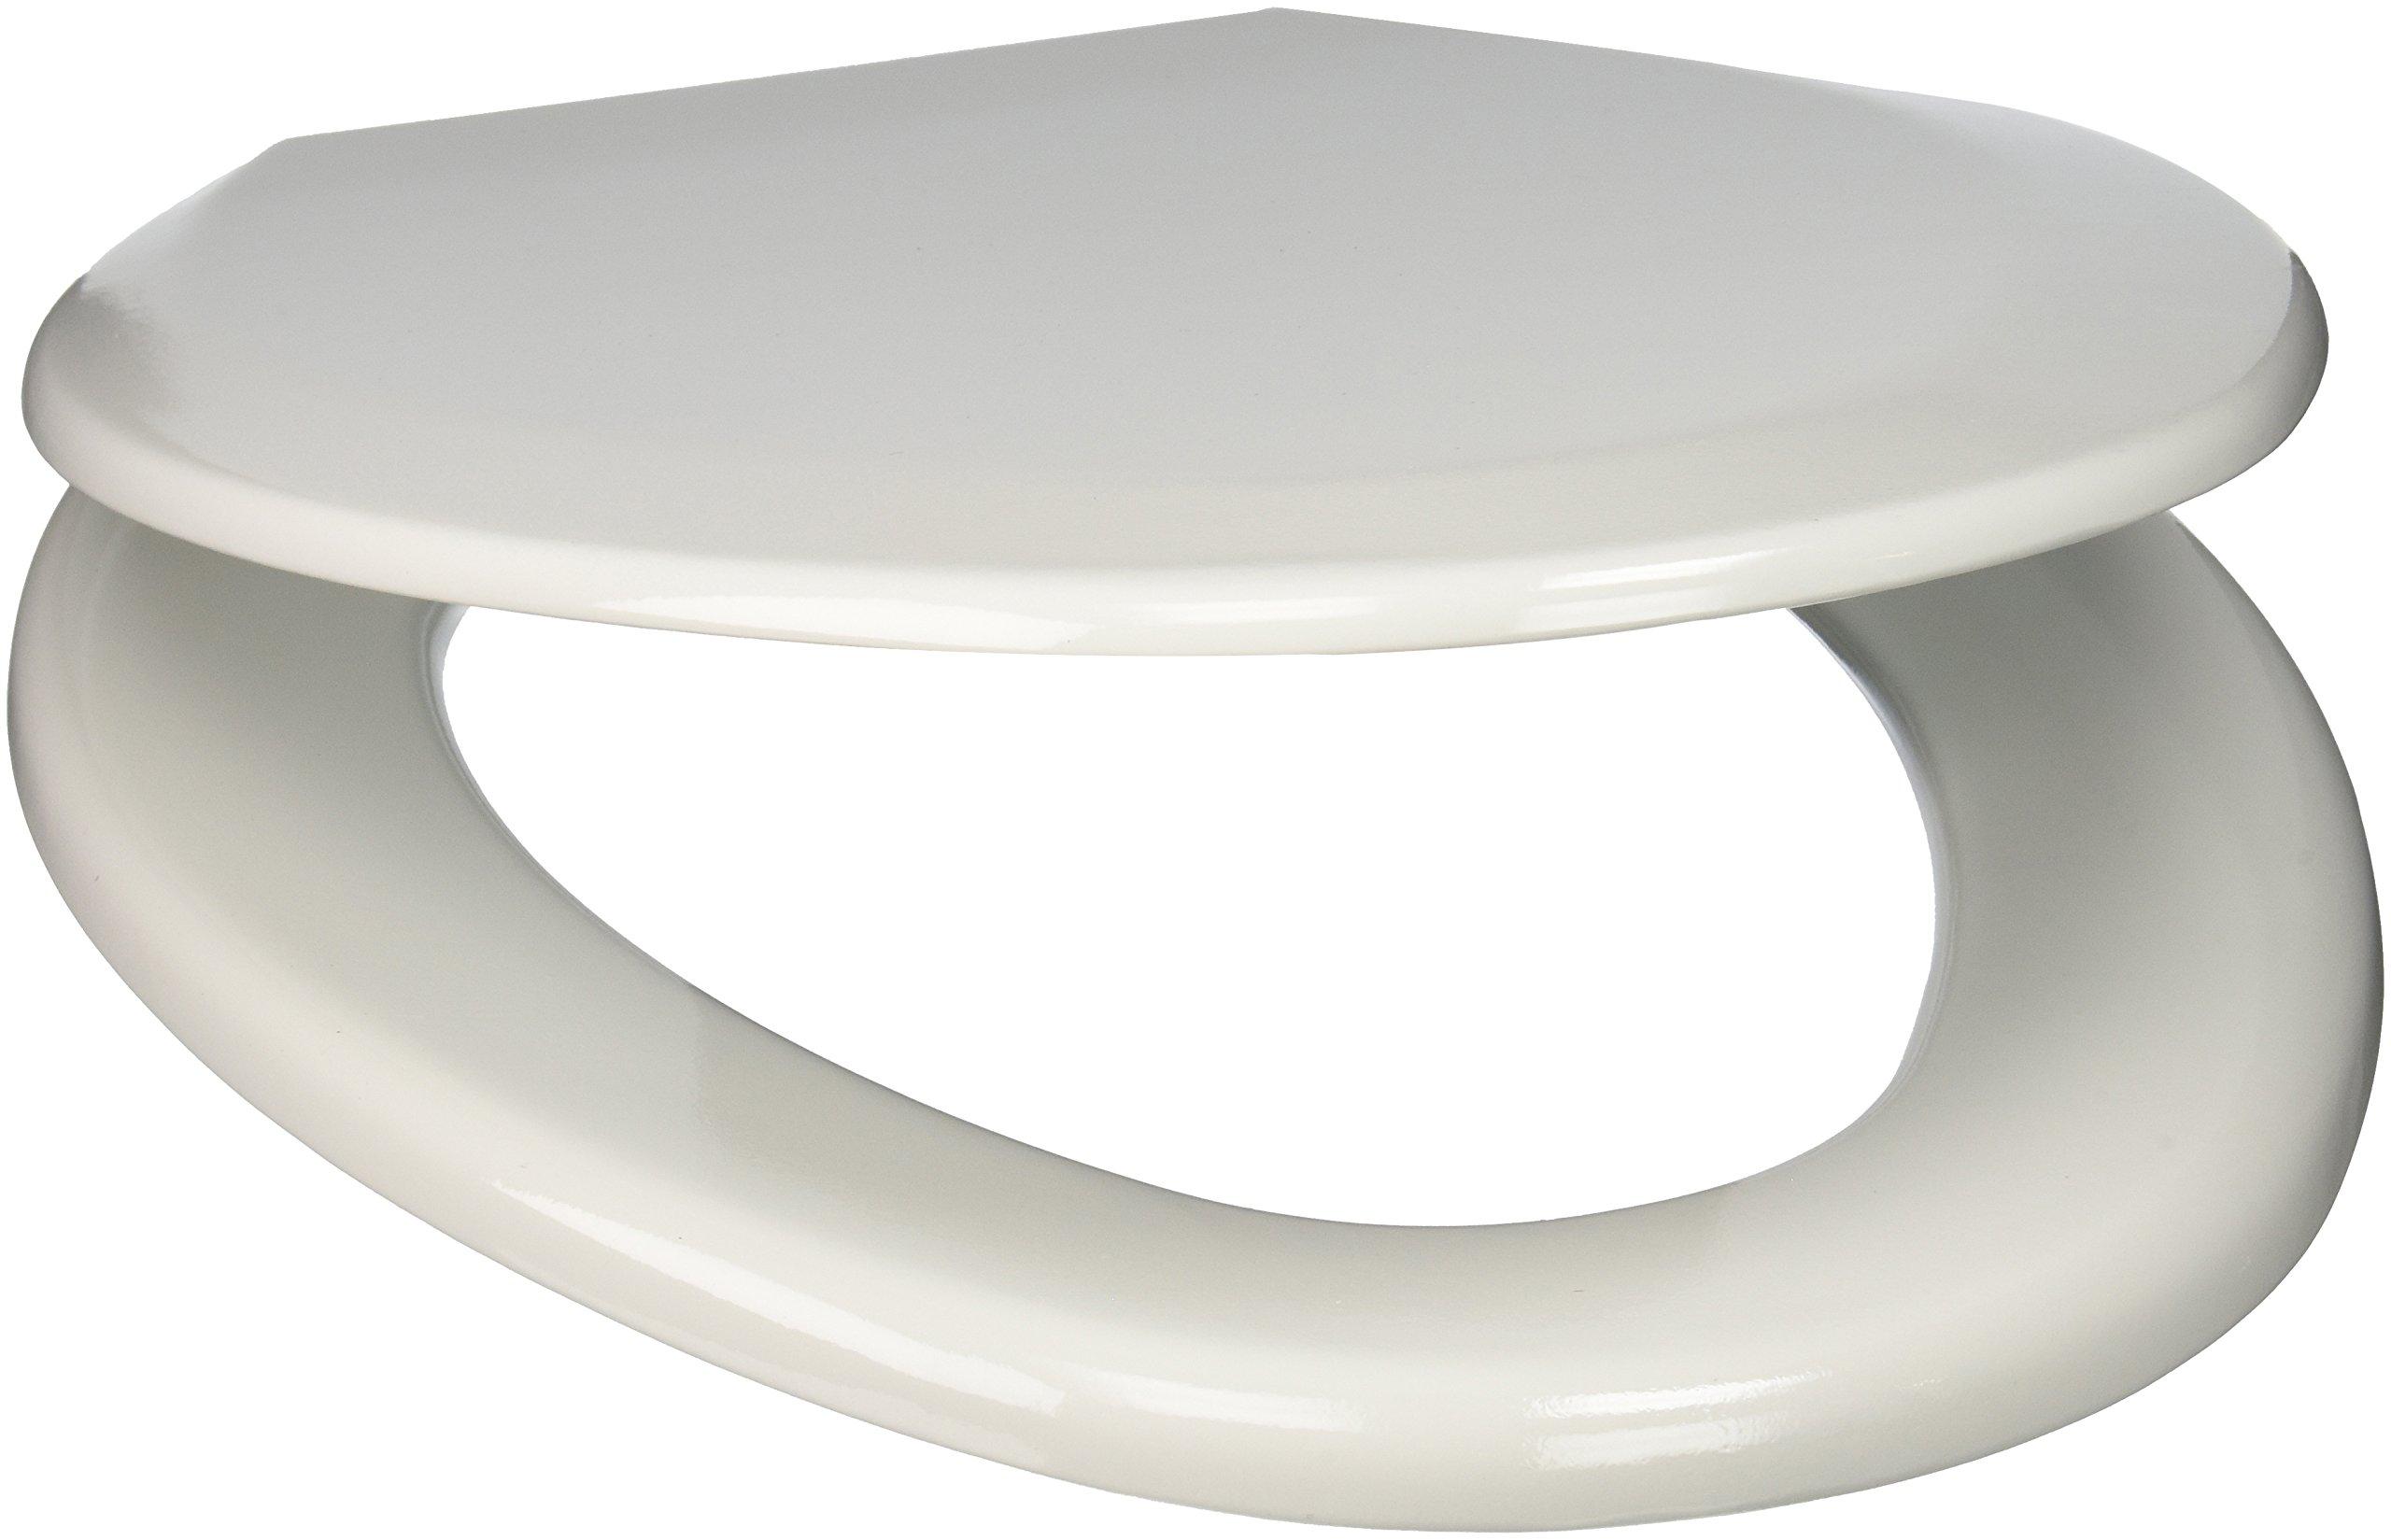 PlumbTech 124-00 Premium Molded Wood Elongated Toilet Seat with Adjustable Hinge, White